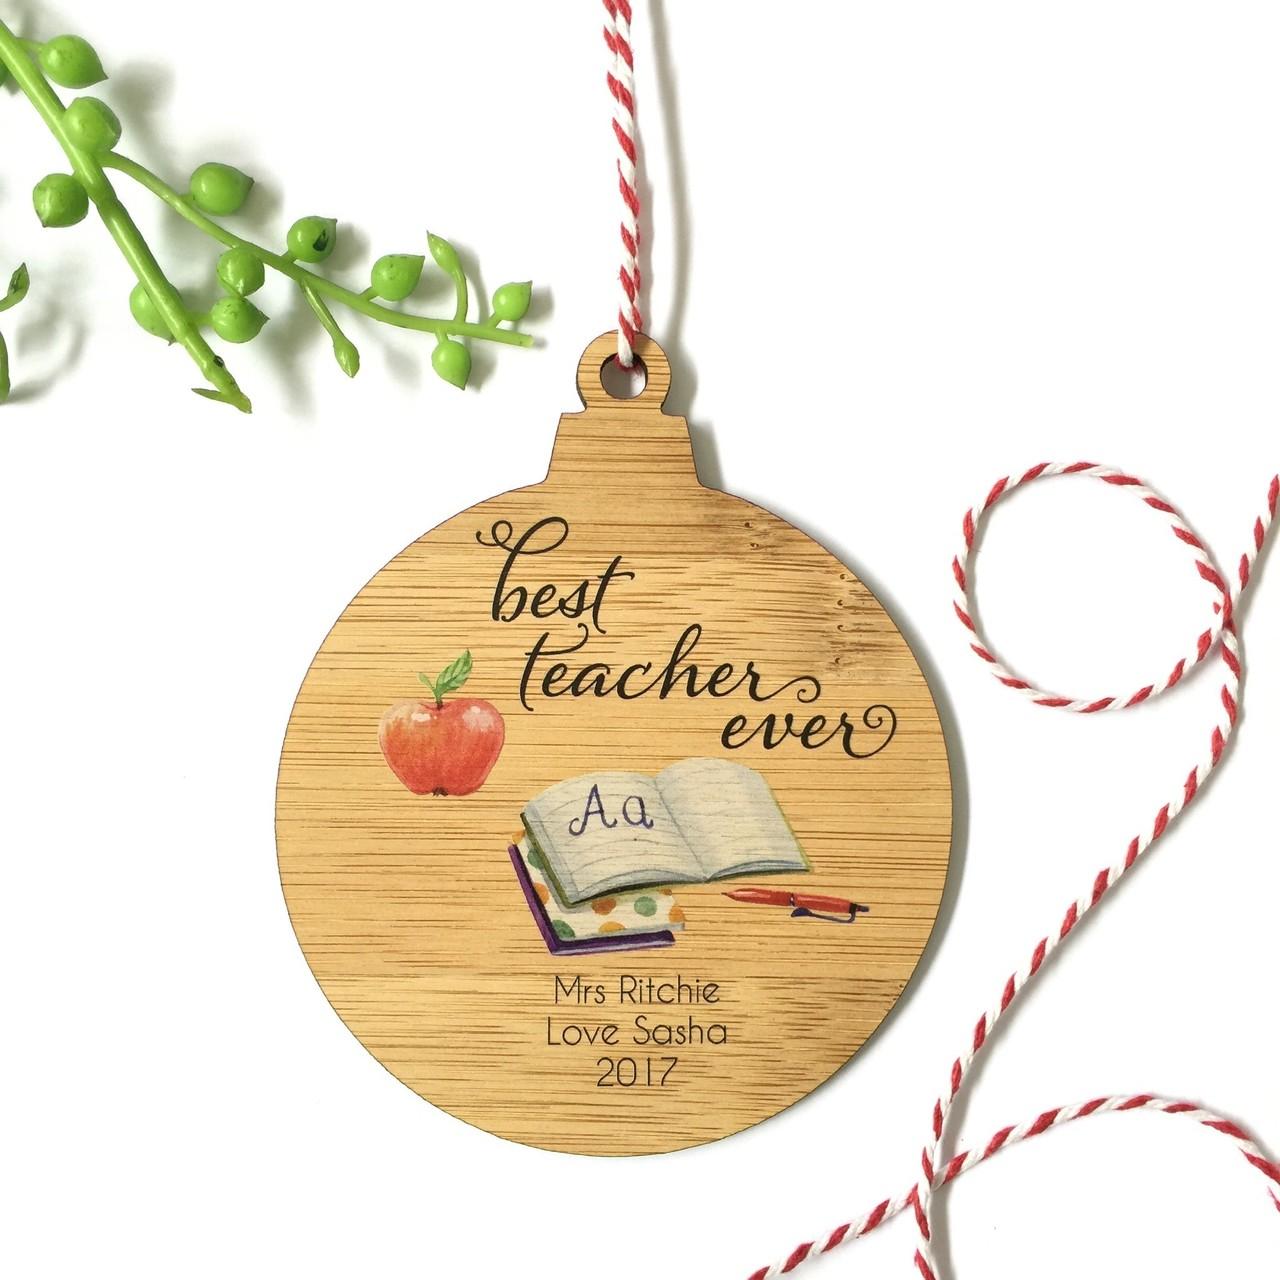 Best Teacher - UV Printed - Personalised Single front image snowman Christmas tree decoration